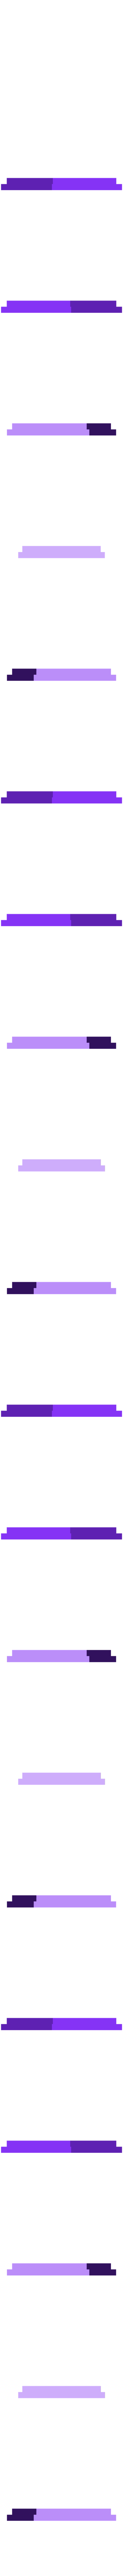 COUVERCLE.stl Download free STL file Distributor of condoms • 3D printer template, SimEtJo